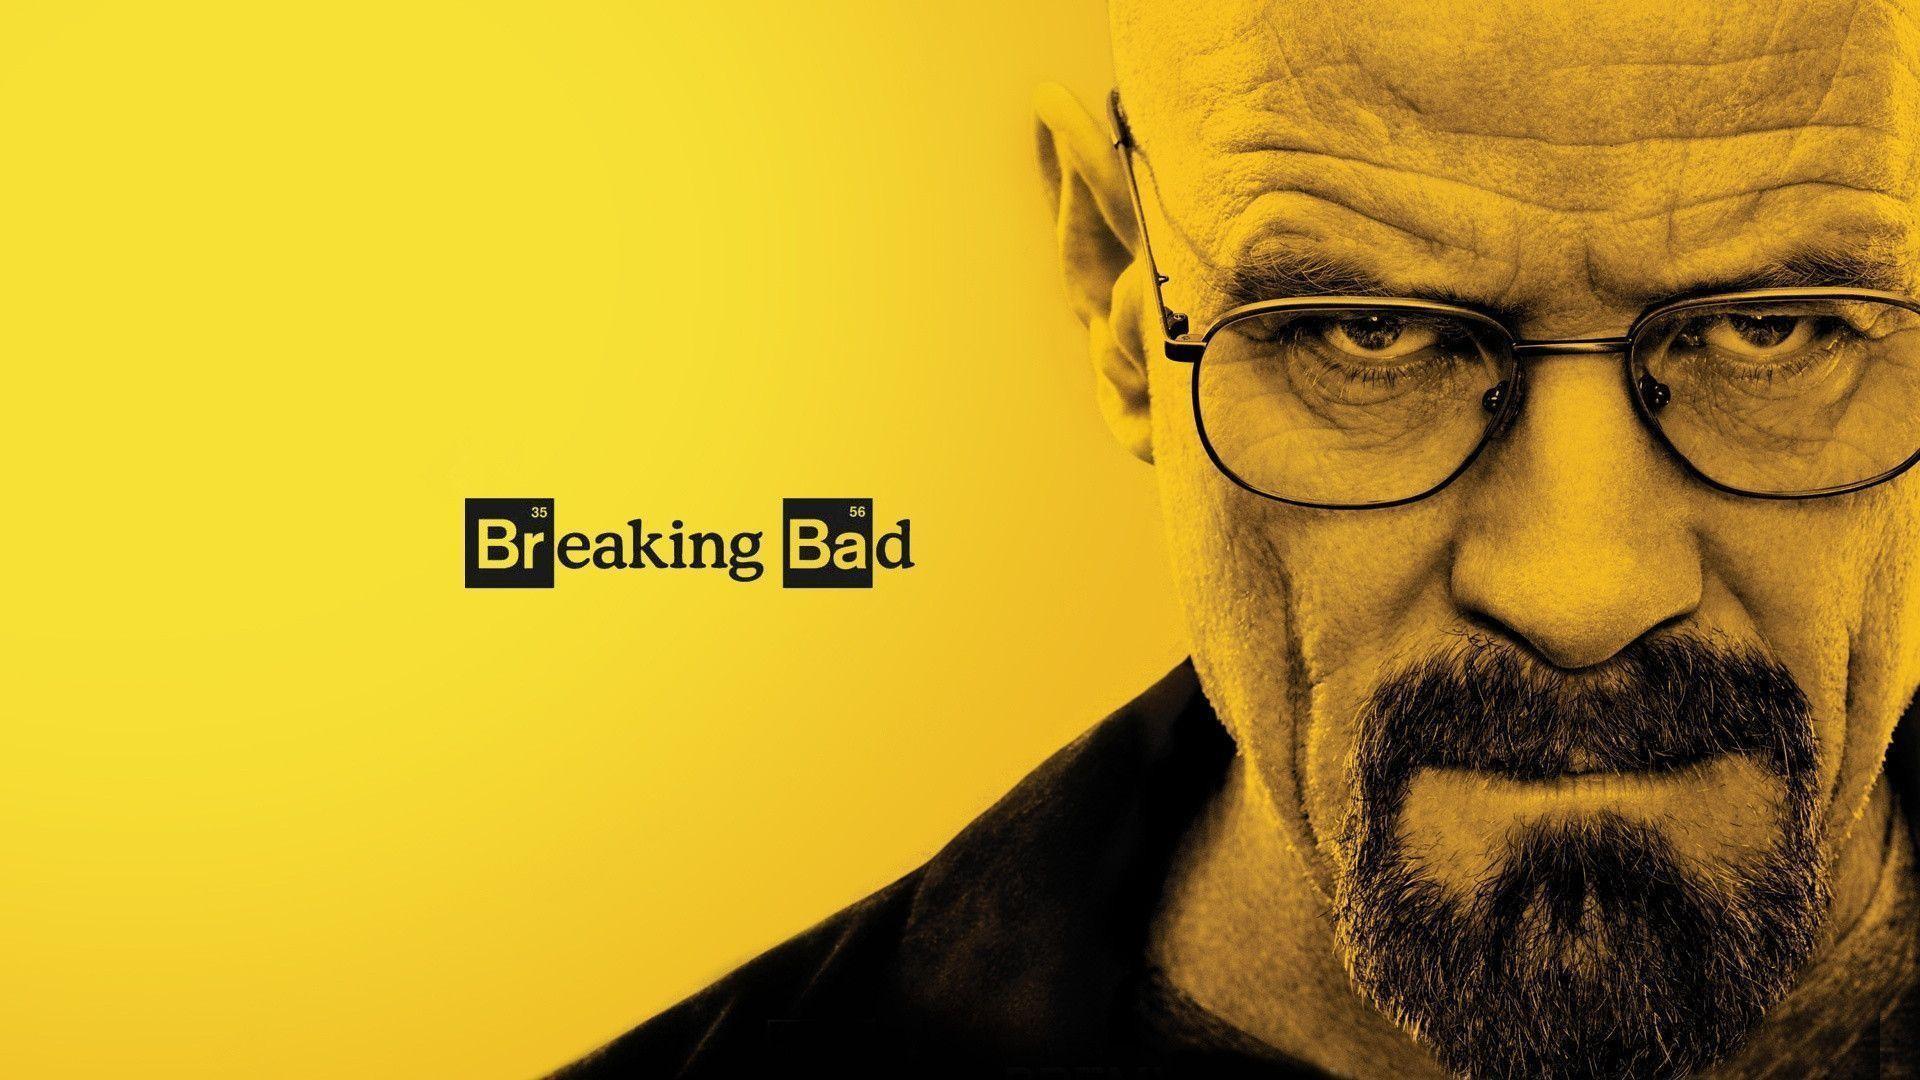 Breaking Bad Wallpapers Top Free Breaking Bad Backgrounds